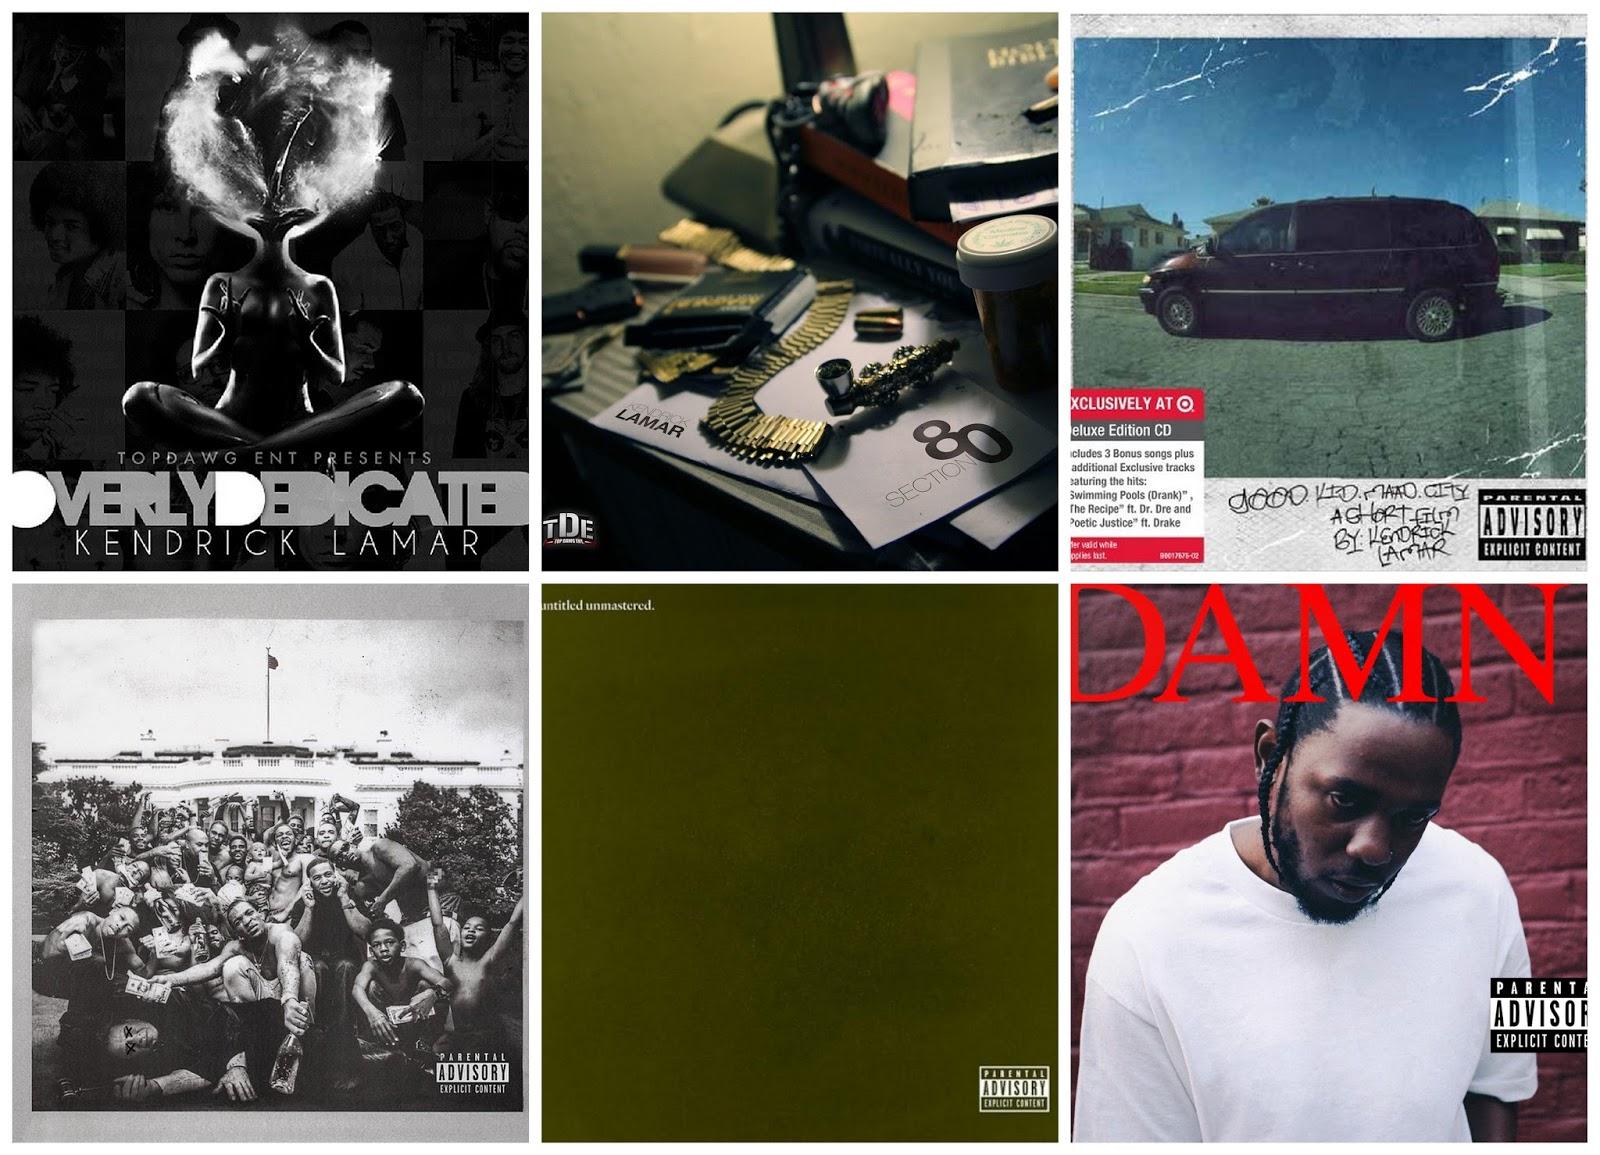 Kendrick lamar discografa mediafire flac 2010 2017 mircoles 24 de enero de 2018 malvernweather Choice Image